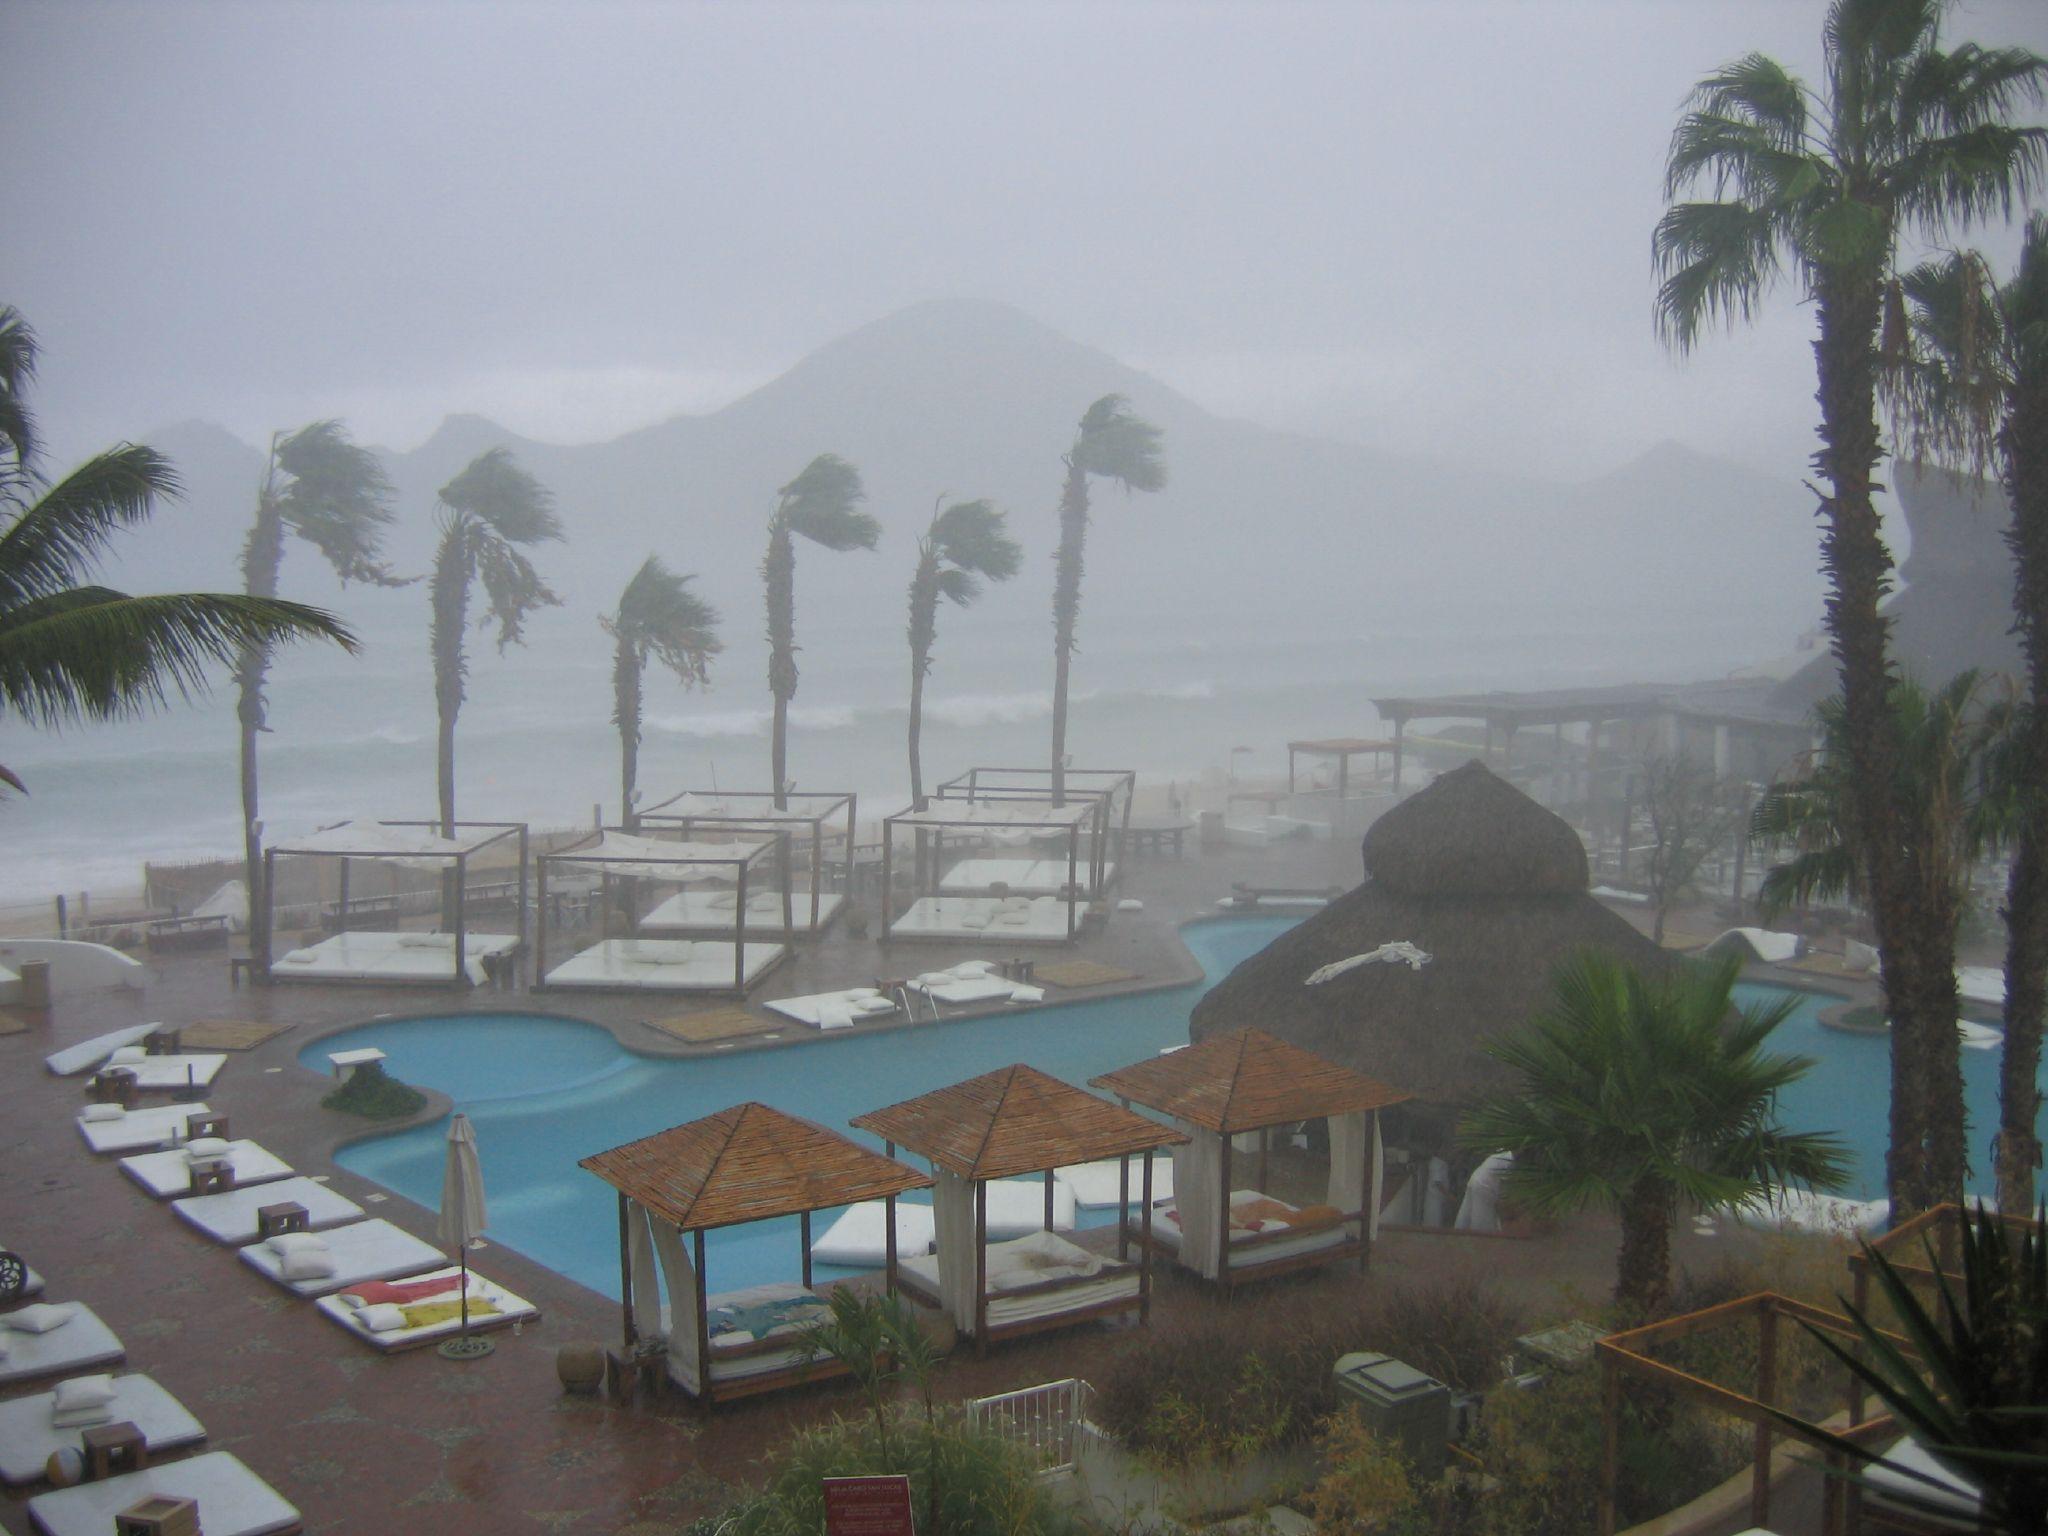 File:Tropical Storm Emilia effects.jpg - Wikimedia Commons